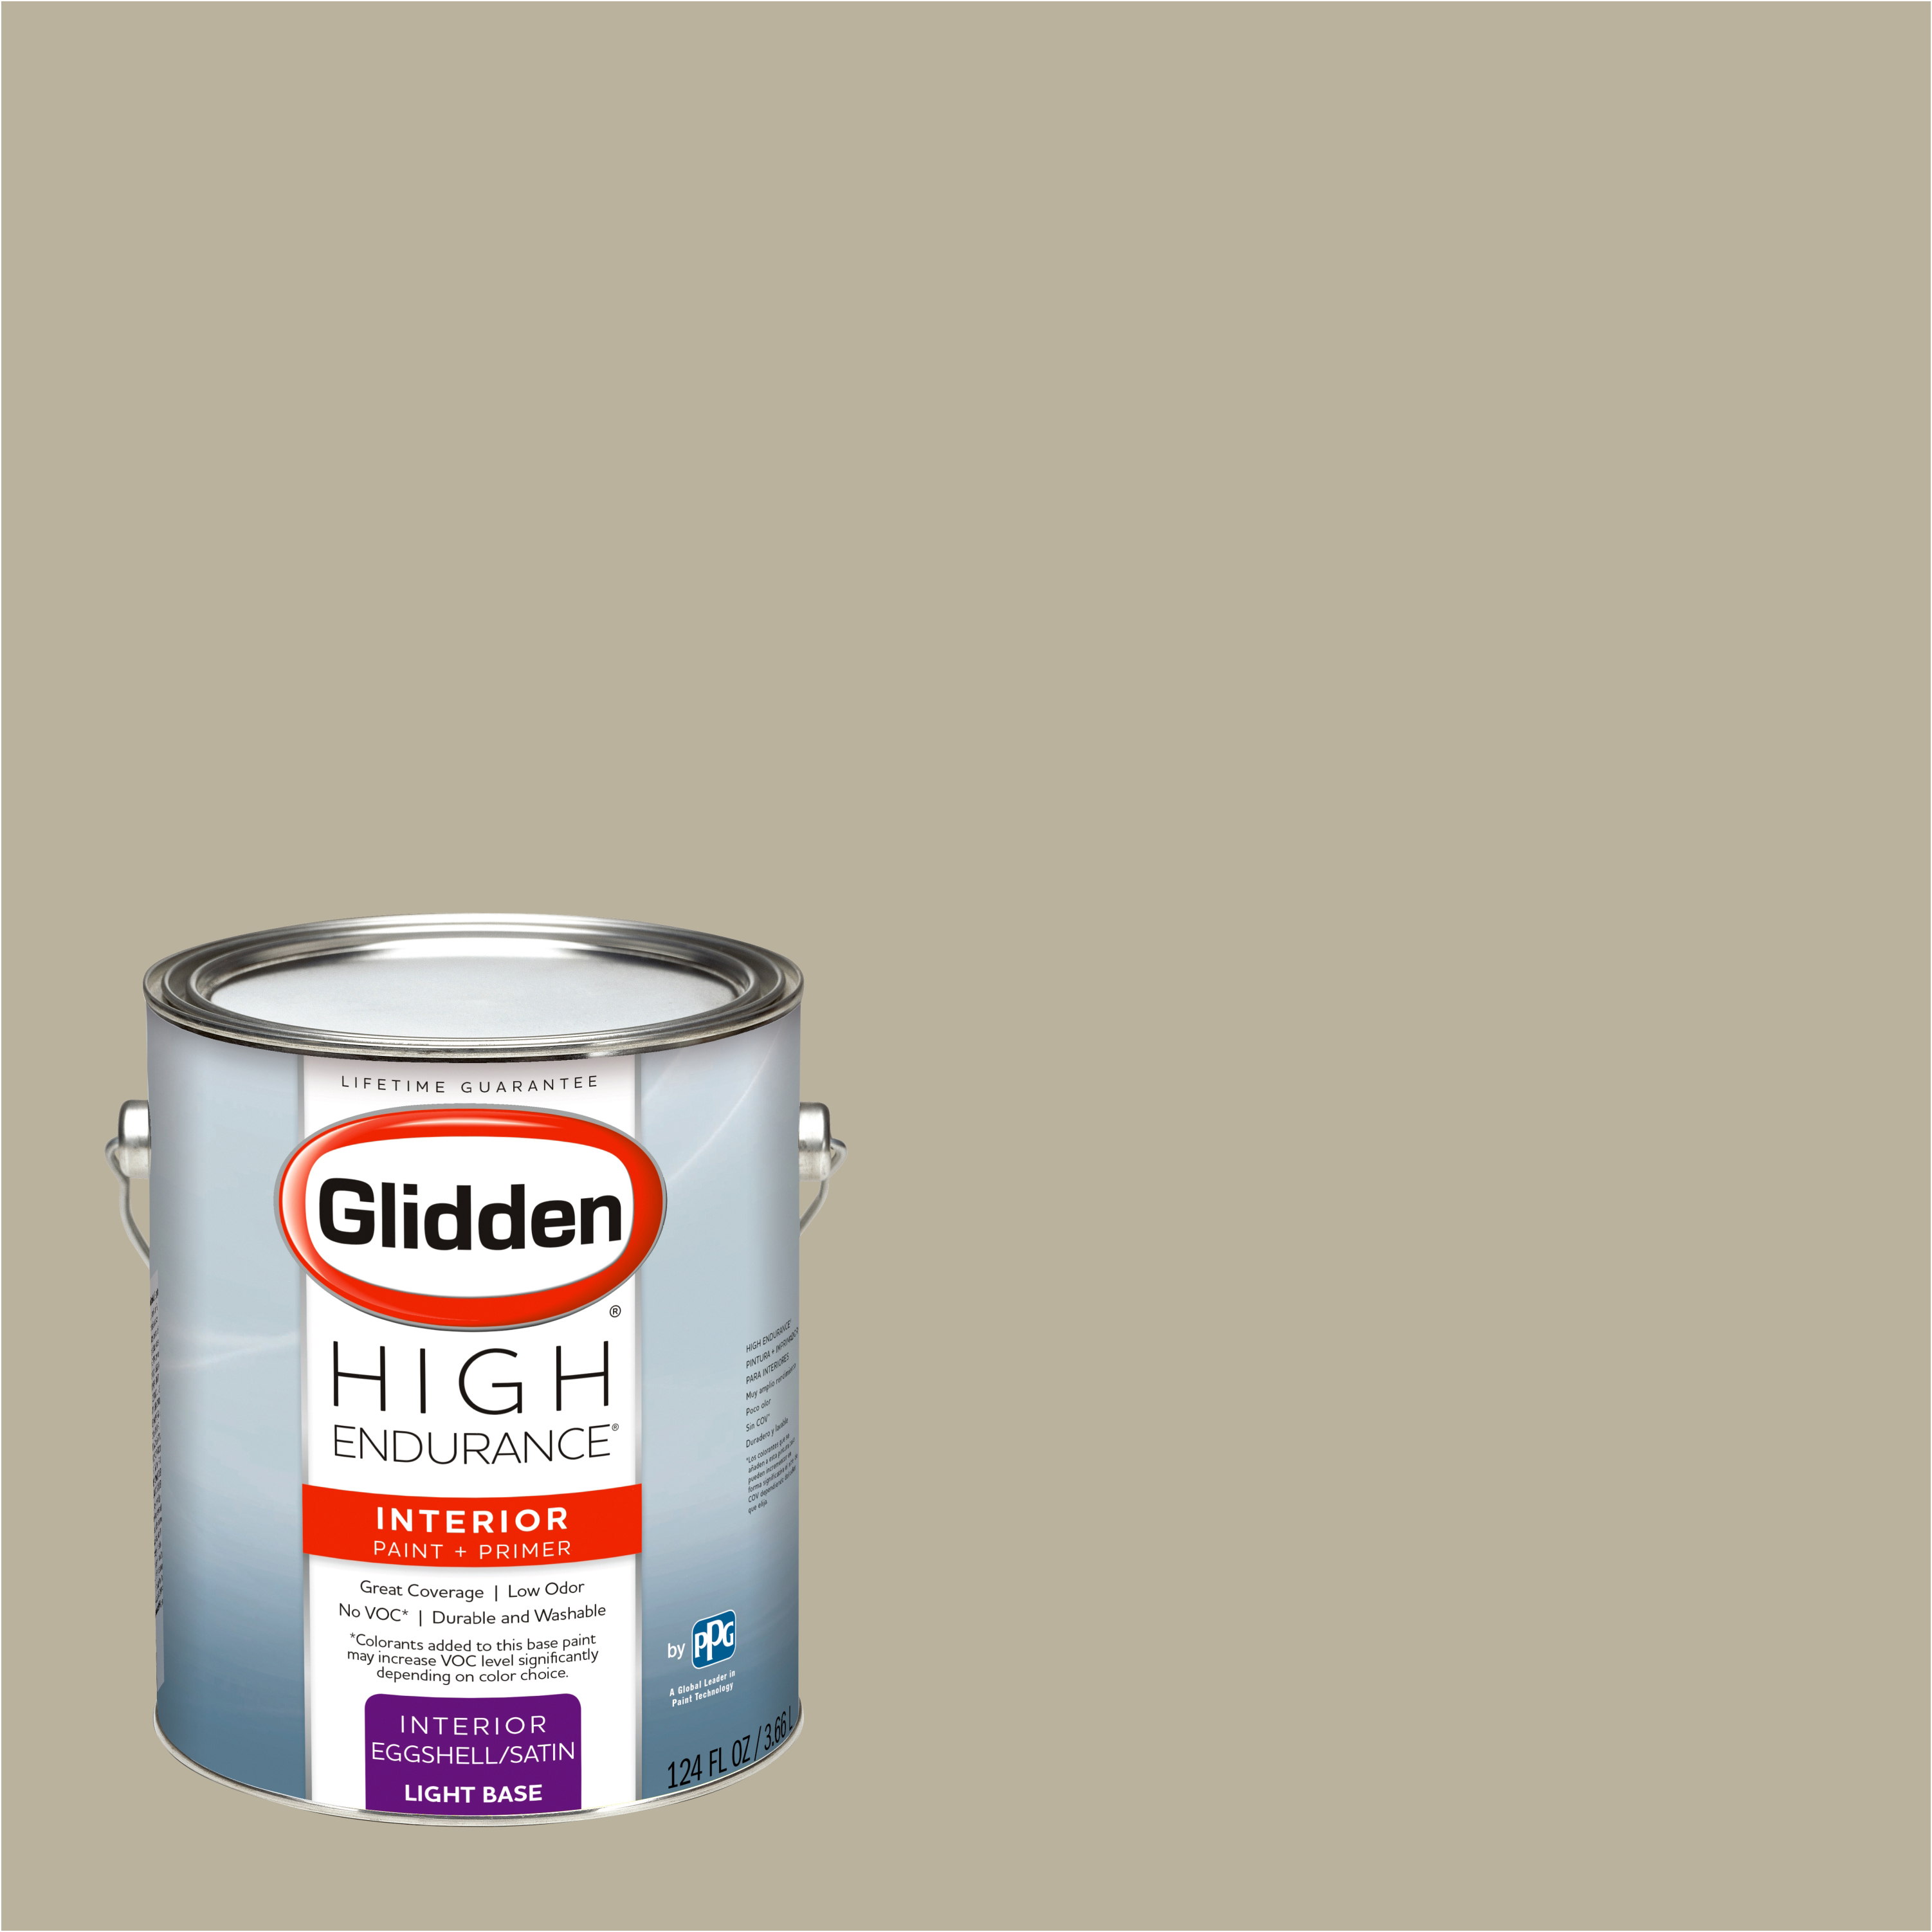 Glidden High Endurance, Interior Paint and Primer, Storybook Straw, # 45YY 44/115